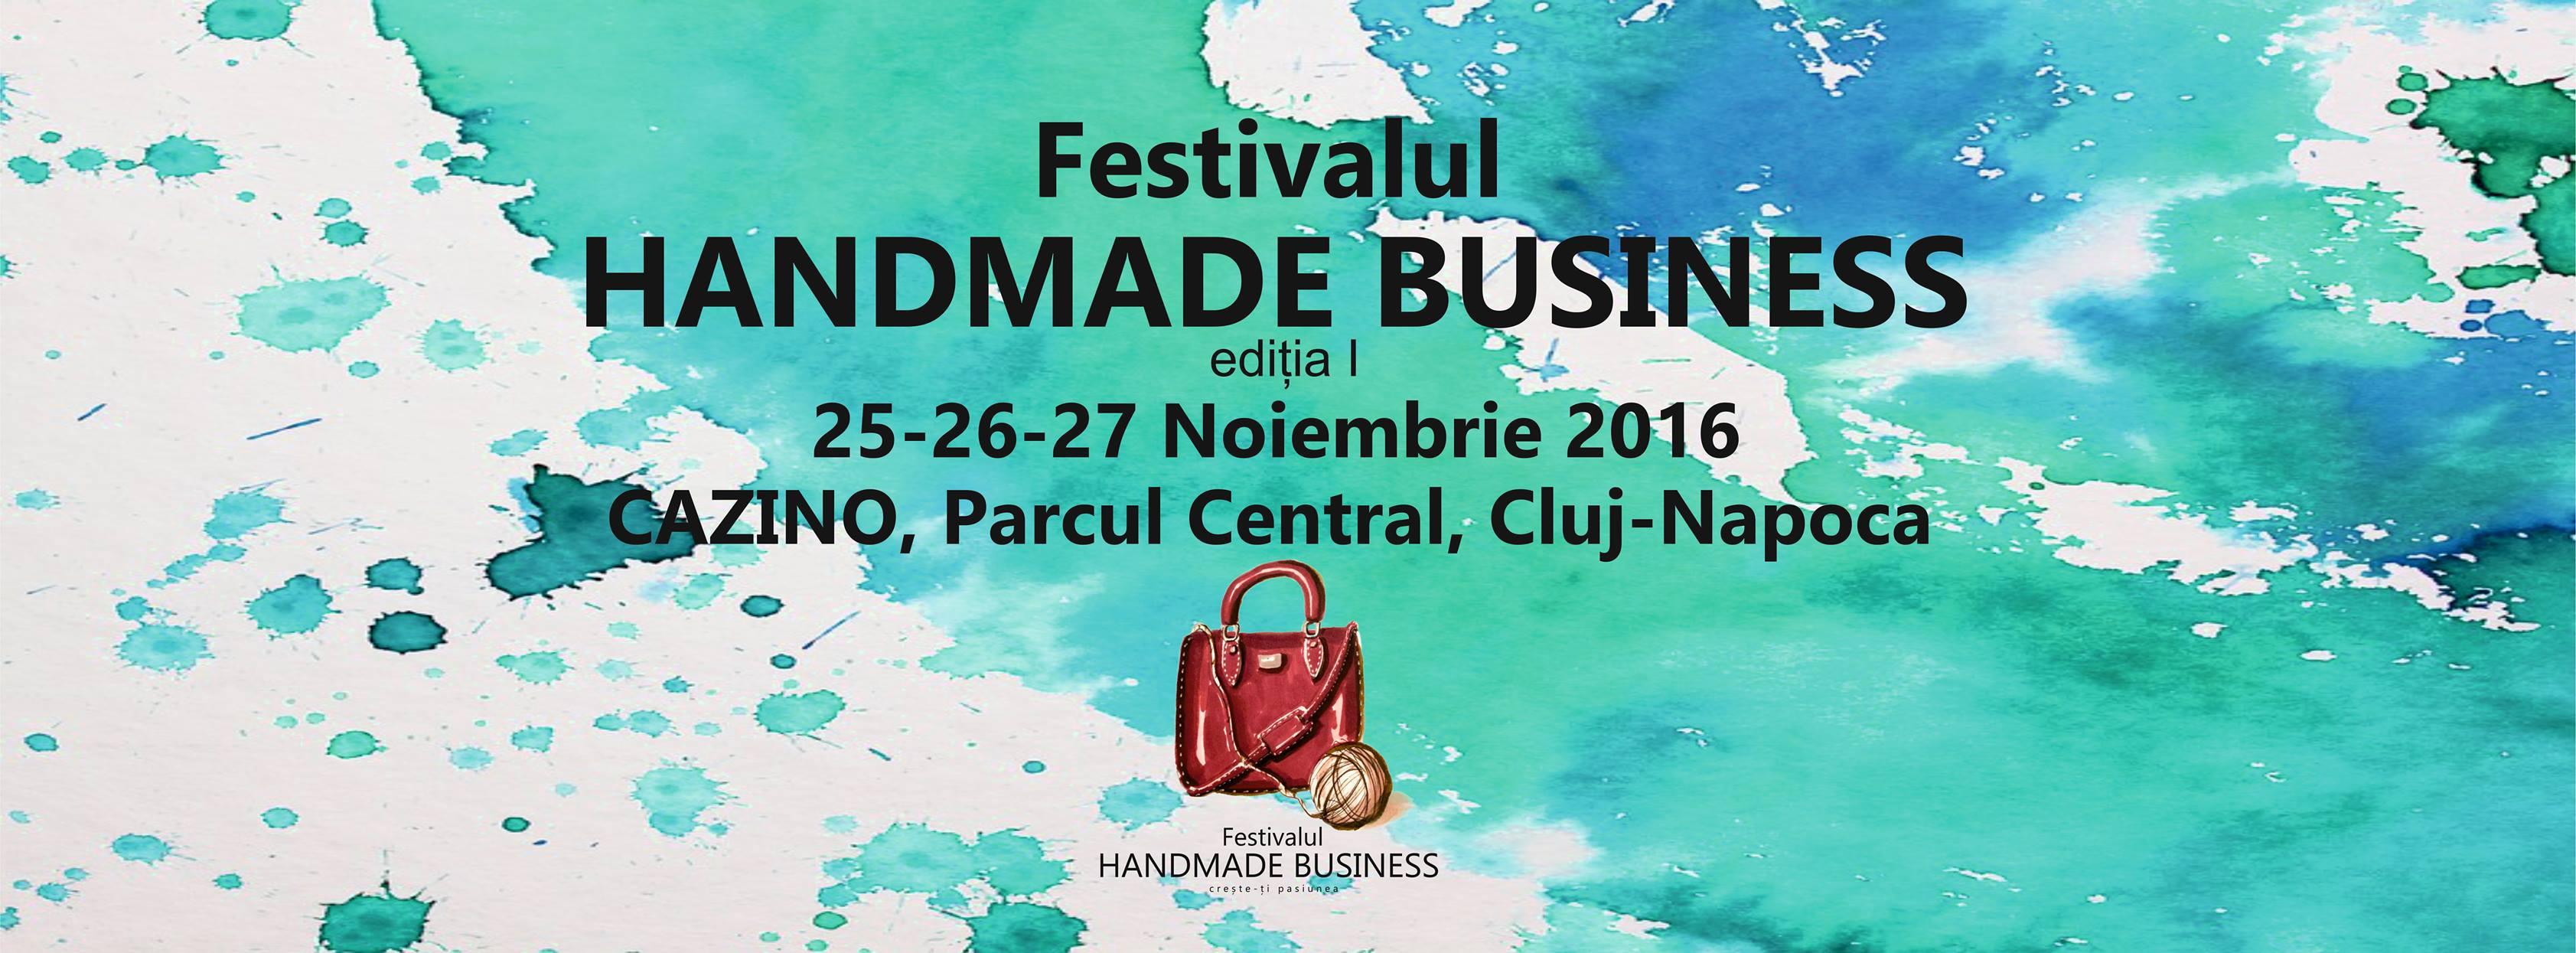 Handmade Business @ Cladirea Casino